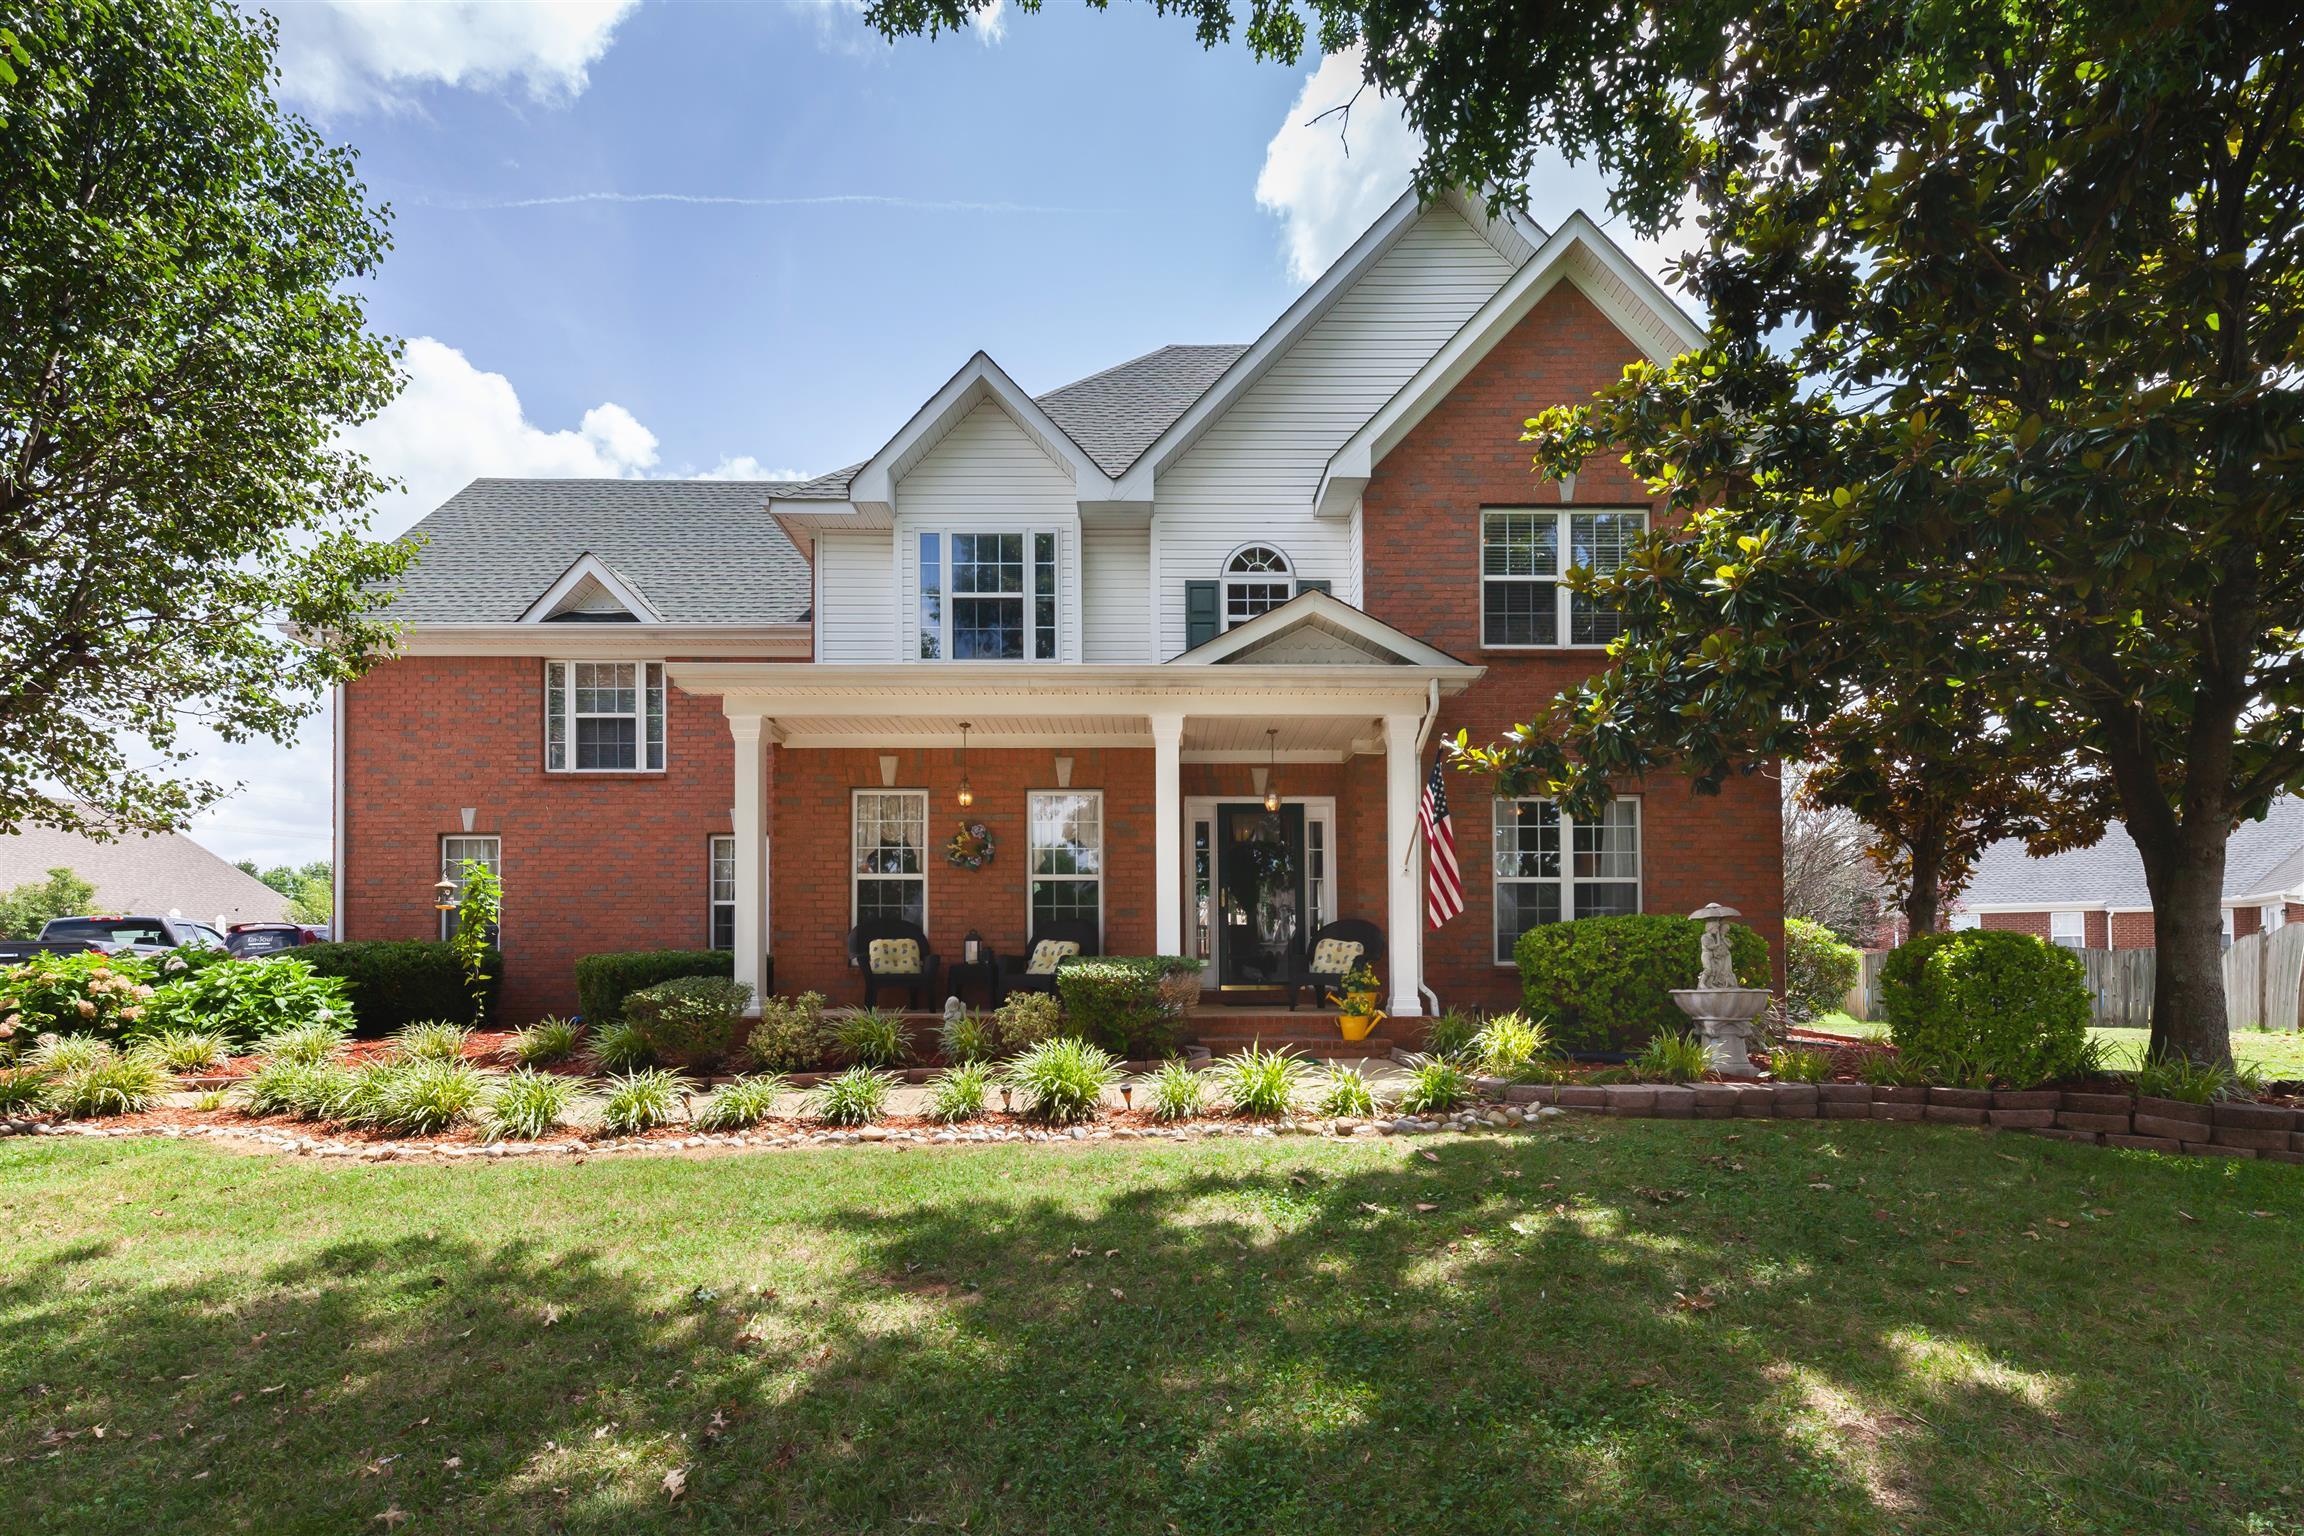 372 Abbie Rd, Murfreesboro, TN 37128 - Murfreesboro, TN real estate listing